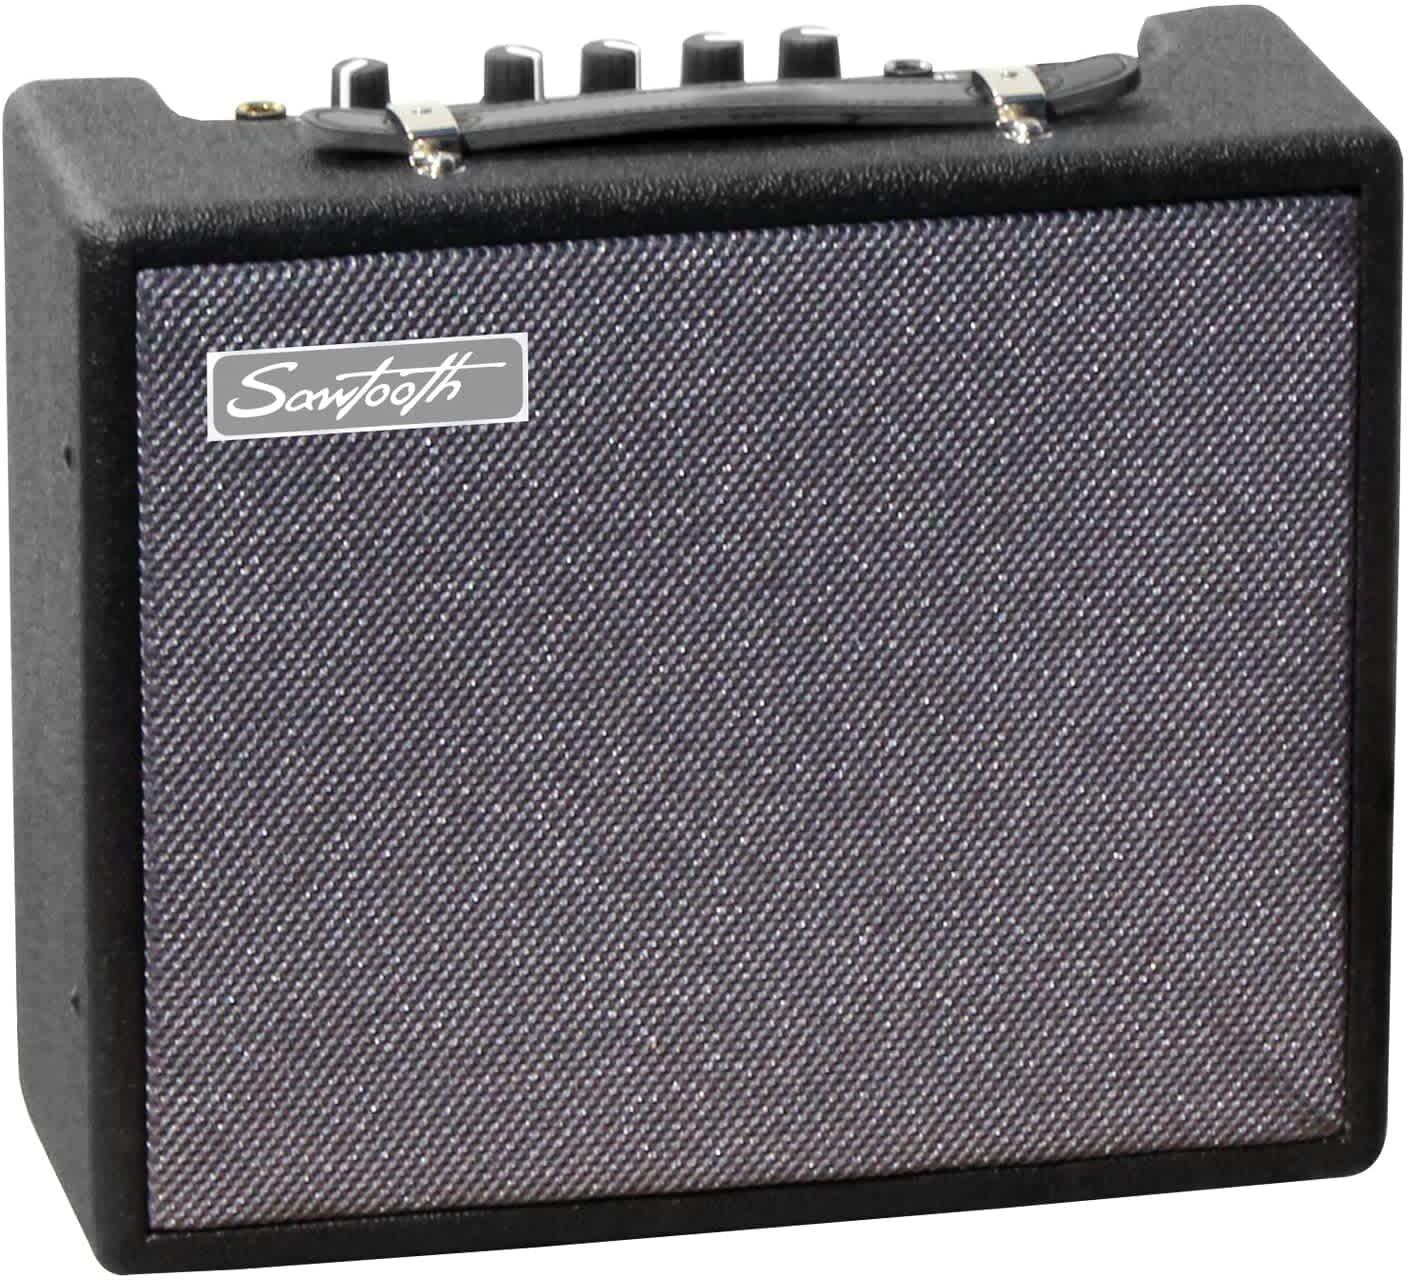 Sawtooth 10W Electric Guitar Amp